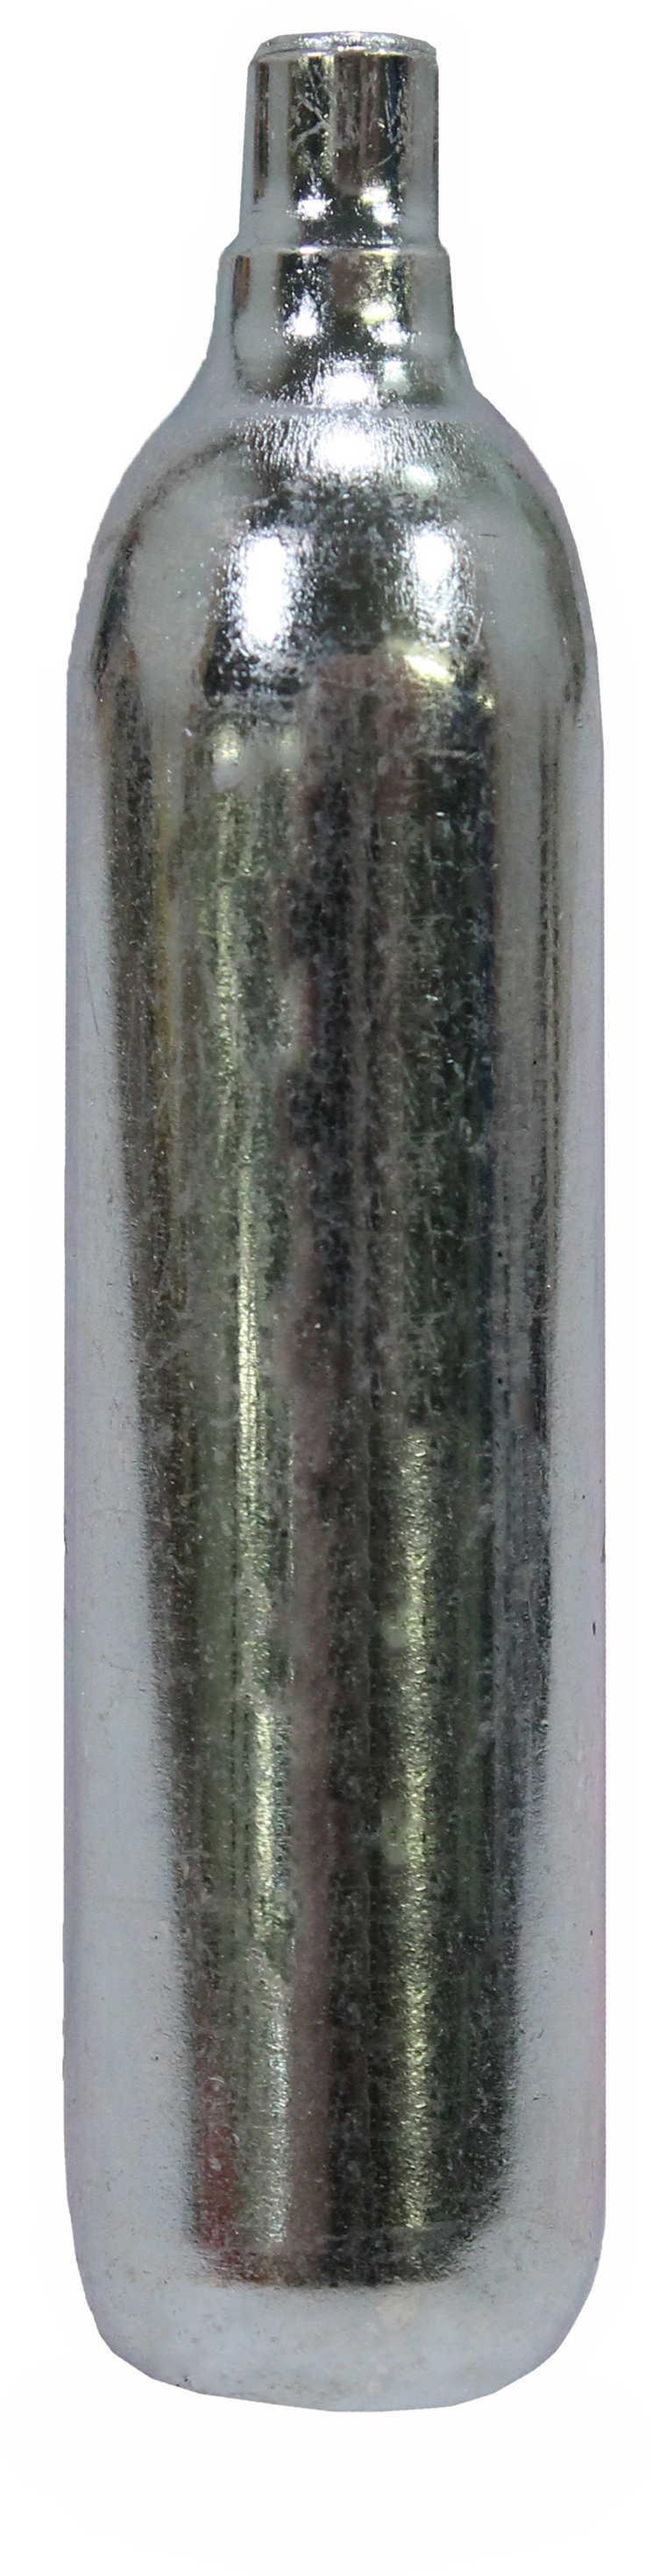 Daisy Model 7580 Powerline CO2 Cylinders 12 Grams 5 Per Box 7580